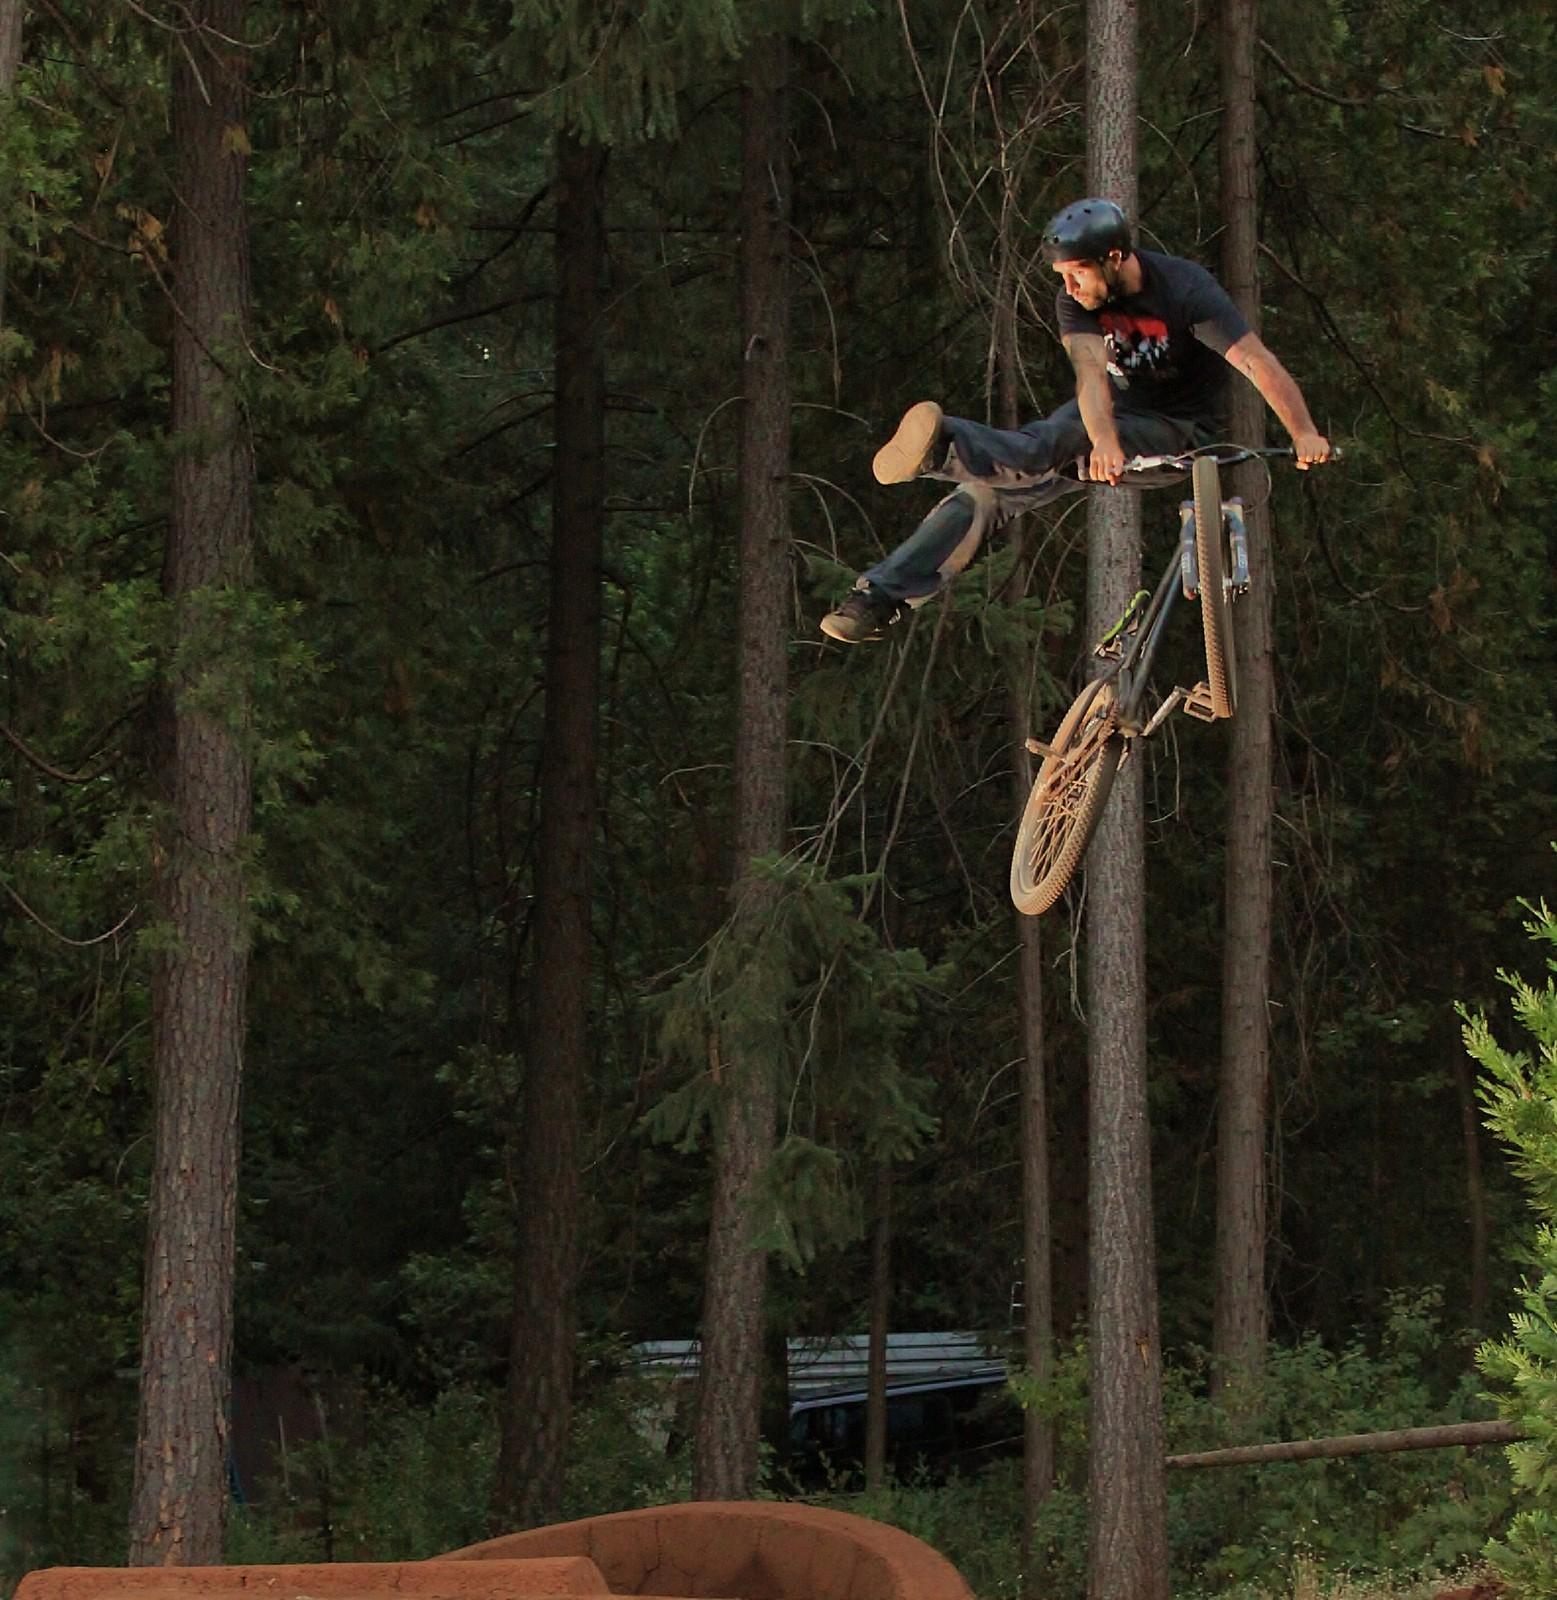 124 - ZD - Mountain Biking Pictures - Vital MTB